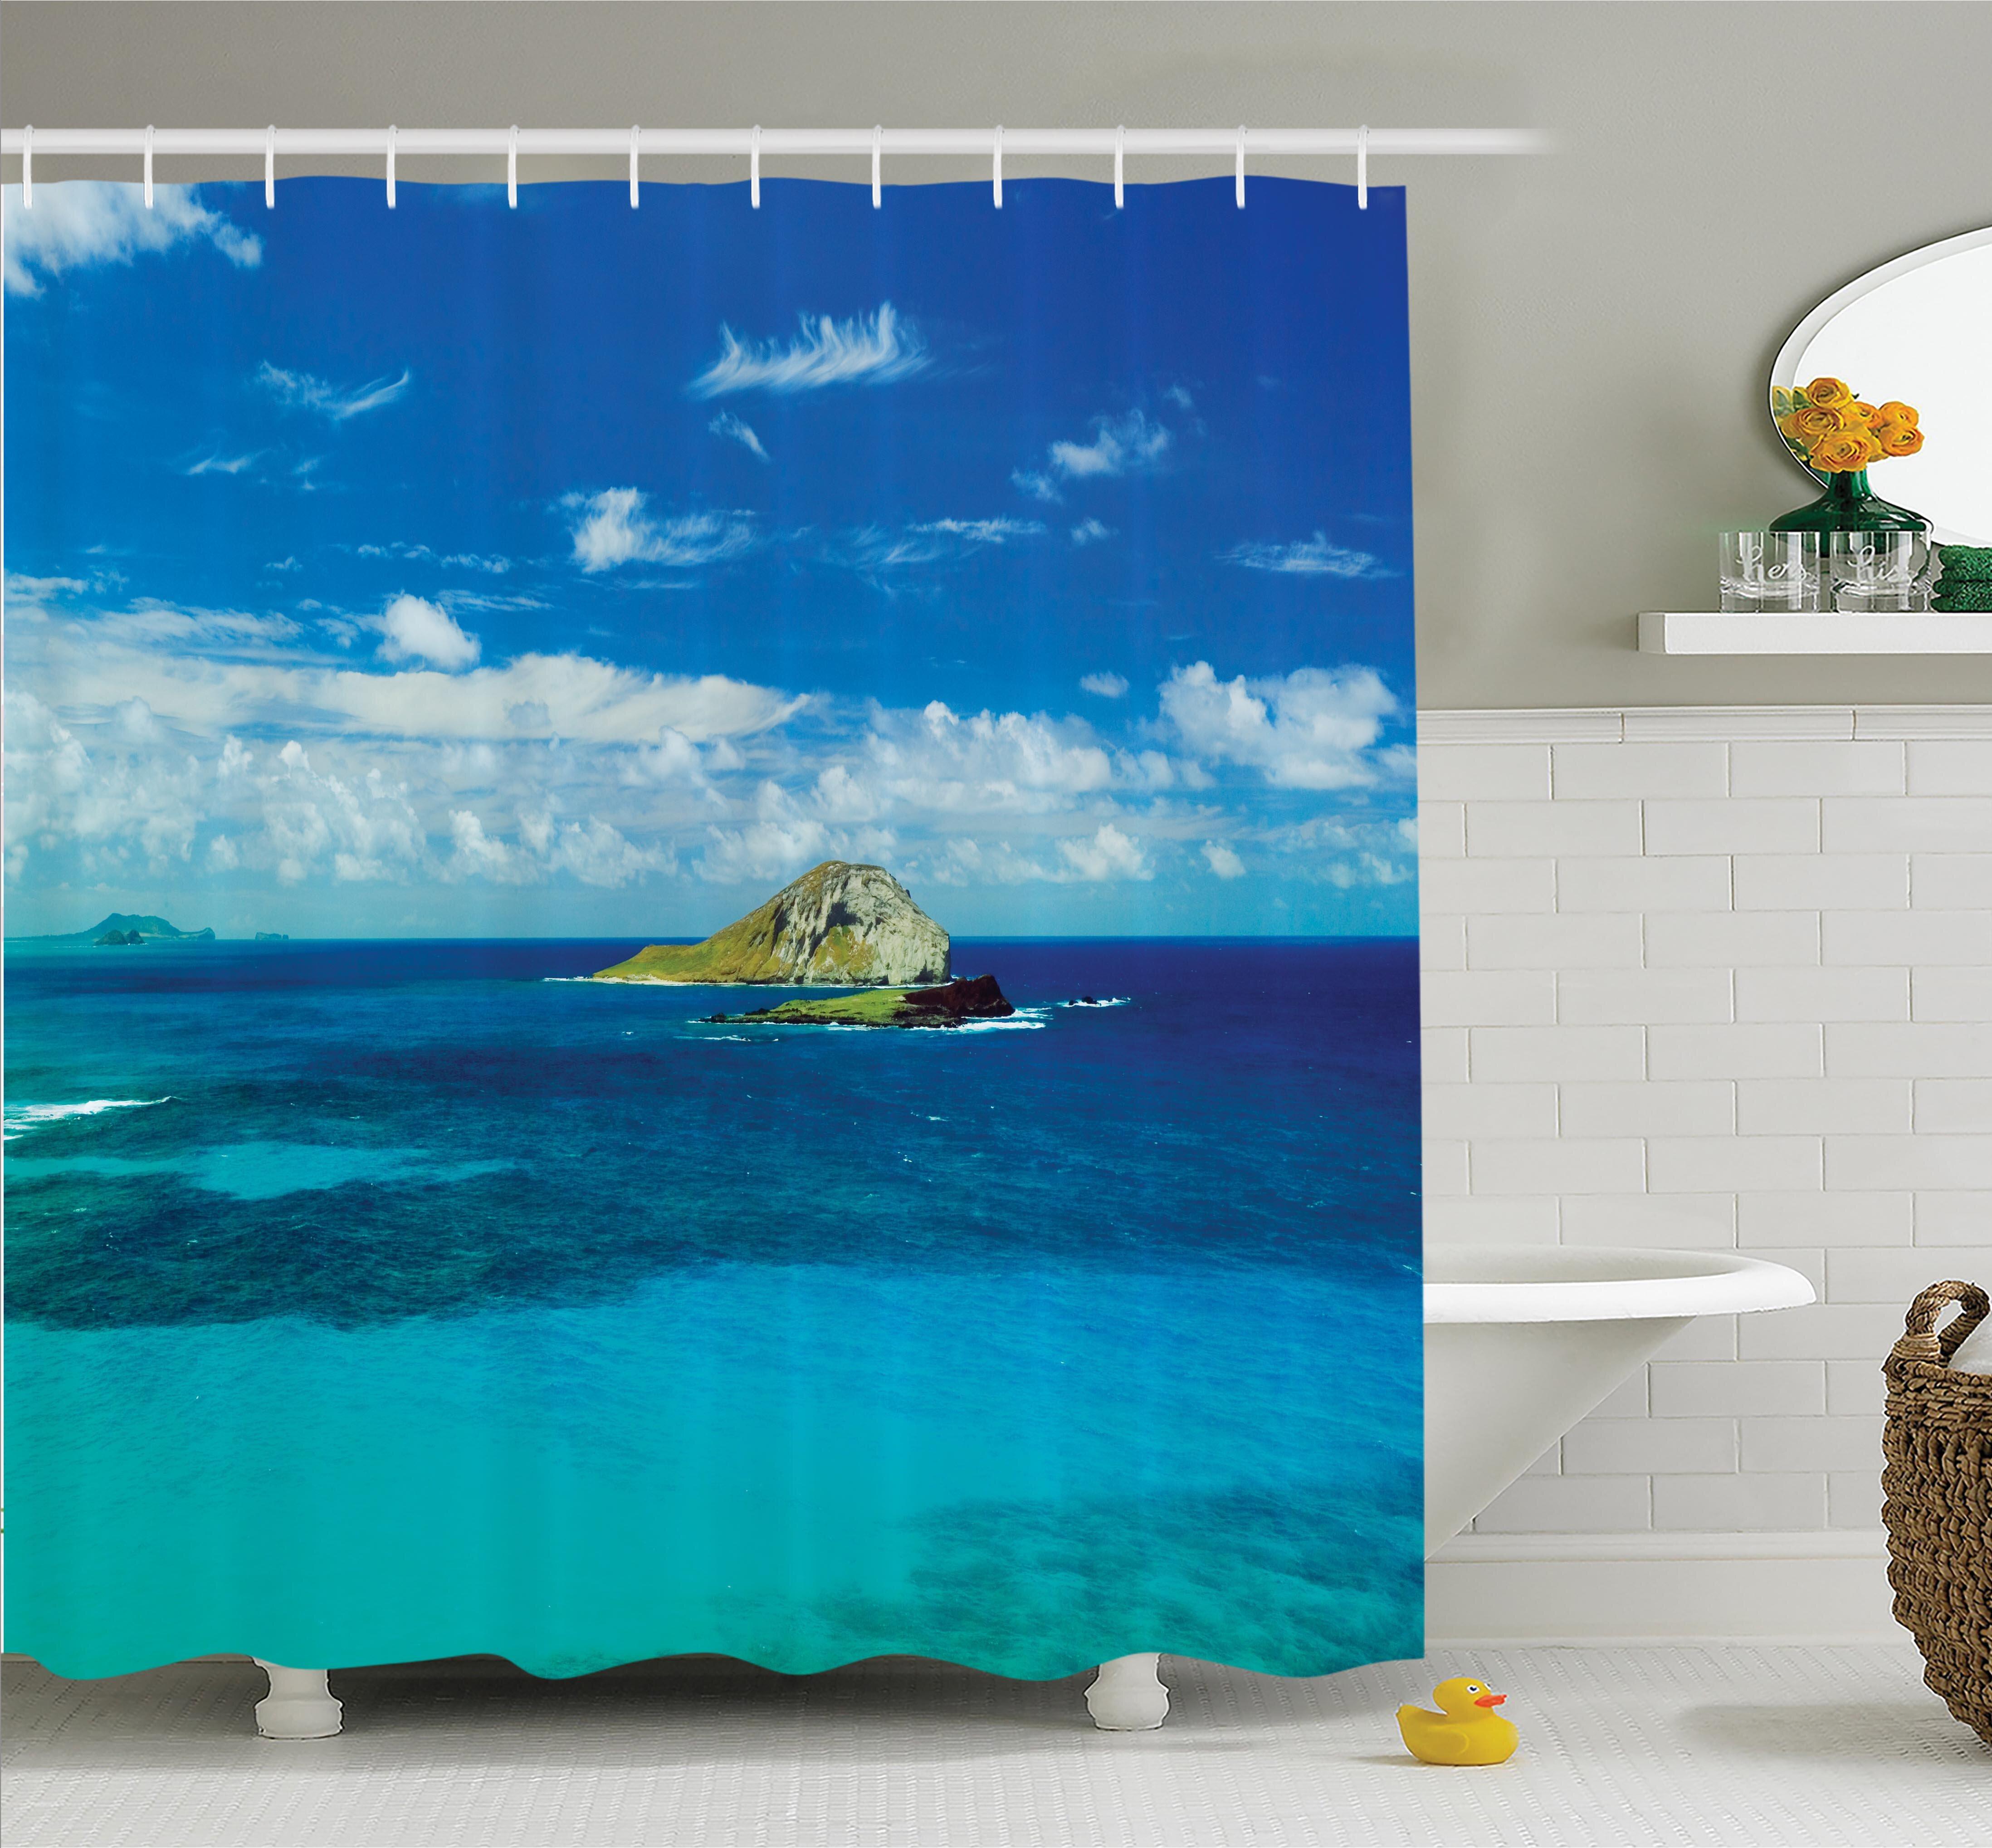 Ambesonne Tropical Hawaiian Island Beach Shower Curtain Set